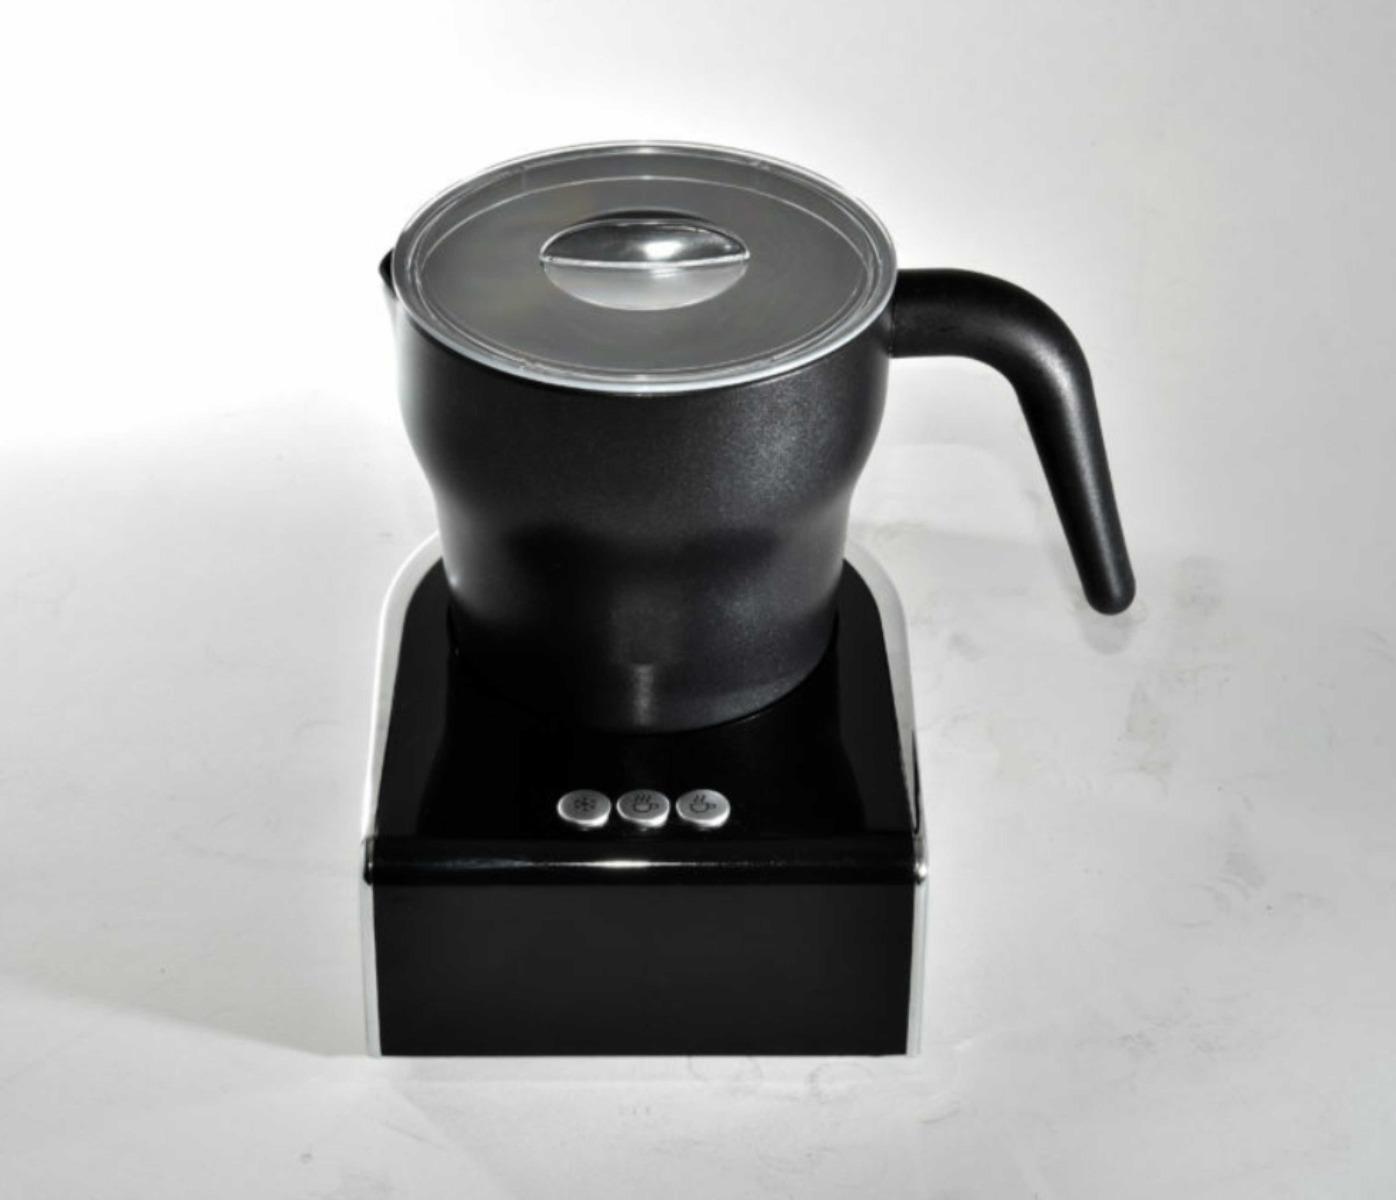 9V00250N | Вспениватель молока и шоколада Panafe CA-MTL-NR | Coffee Shop